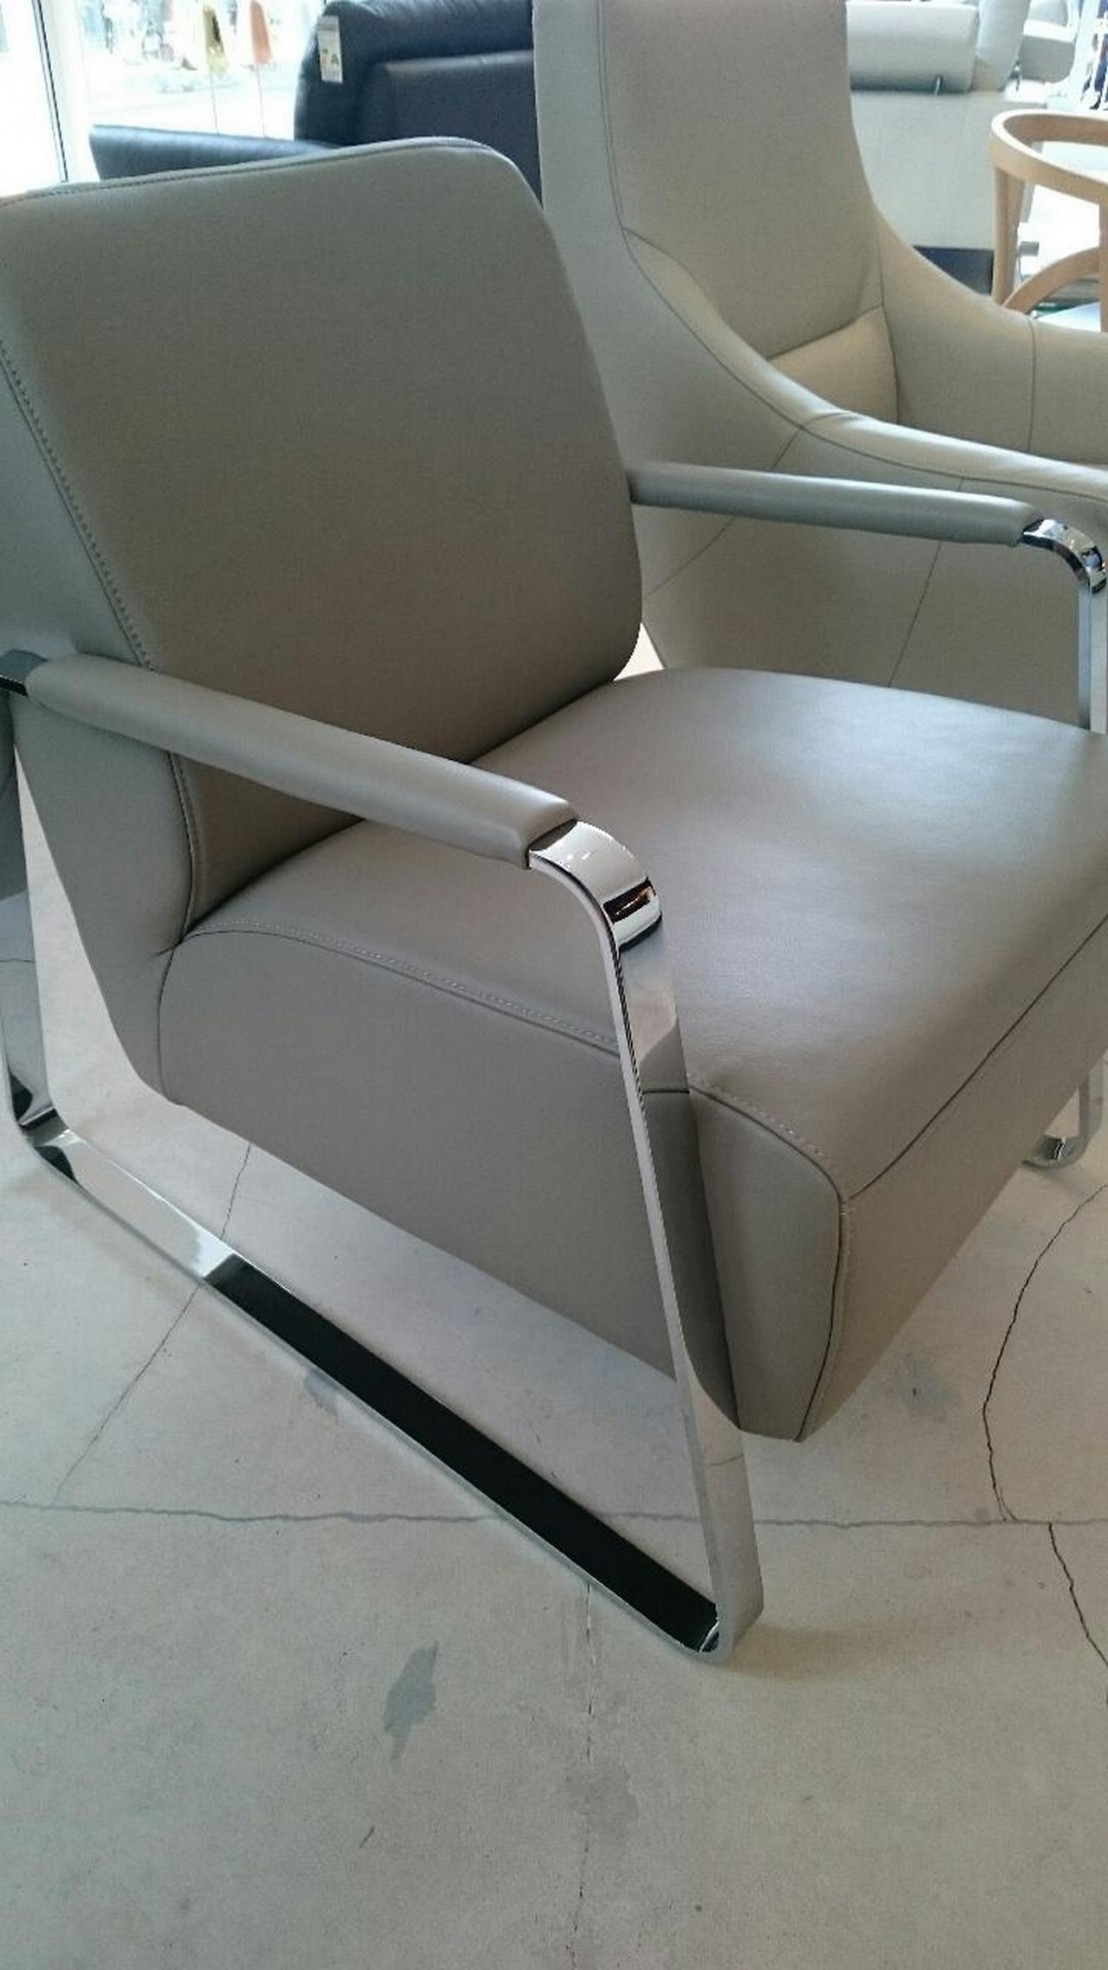 fauteuil design boy cuir pleine fleur deluxe2 nuage. Black Bedroom Furniture Sets. Home Design Ideas